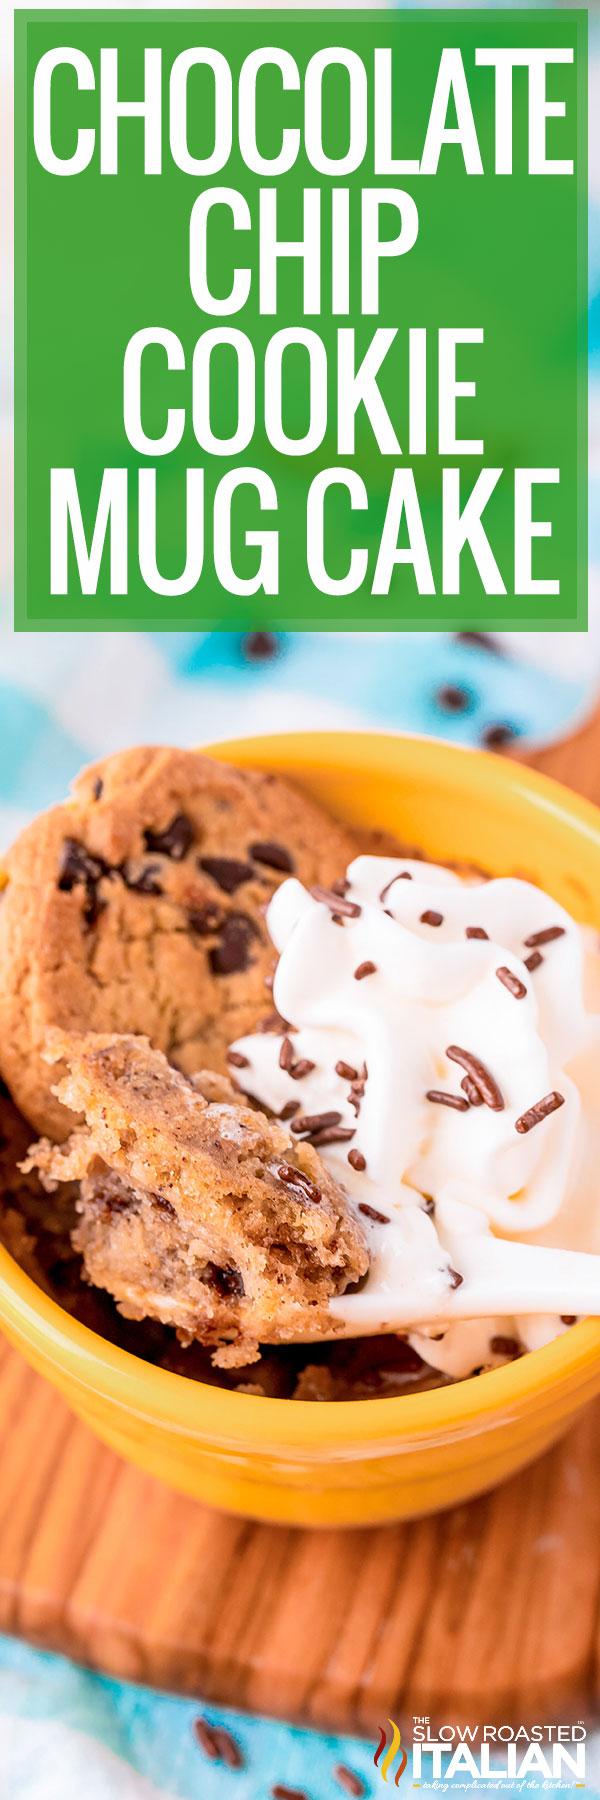 Spoon Chocolate Chip Cookie Mug Cake